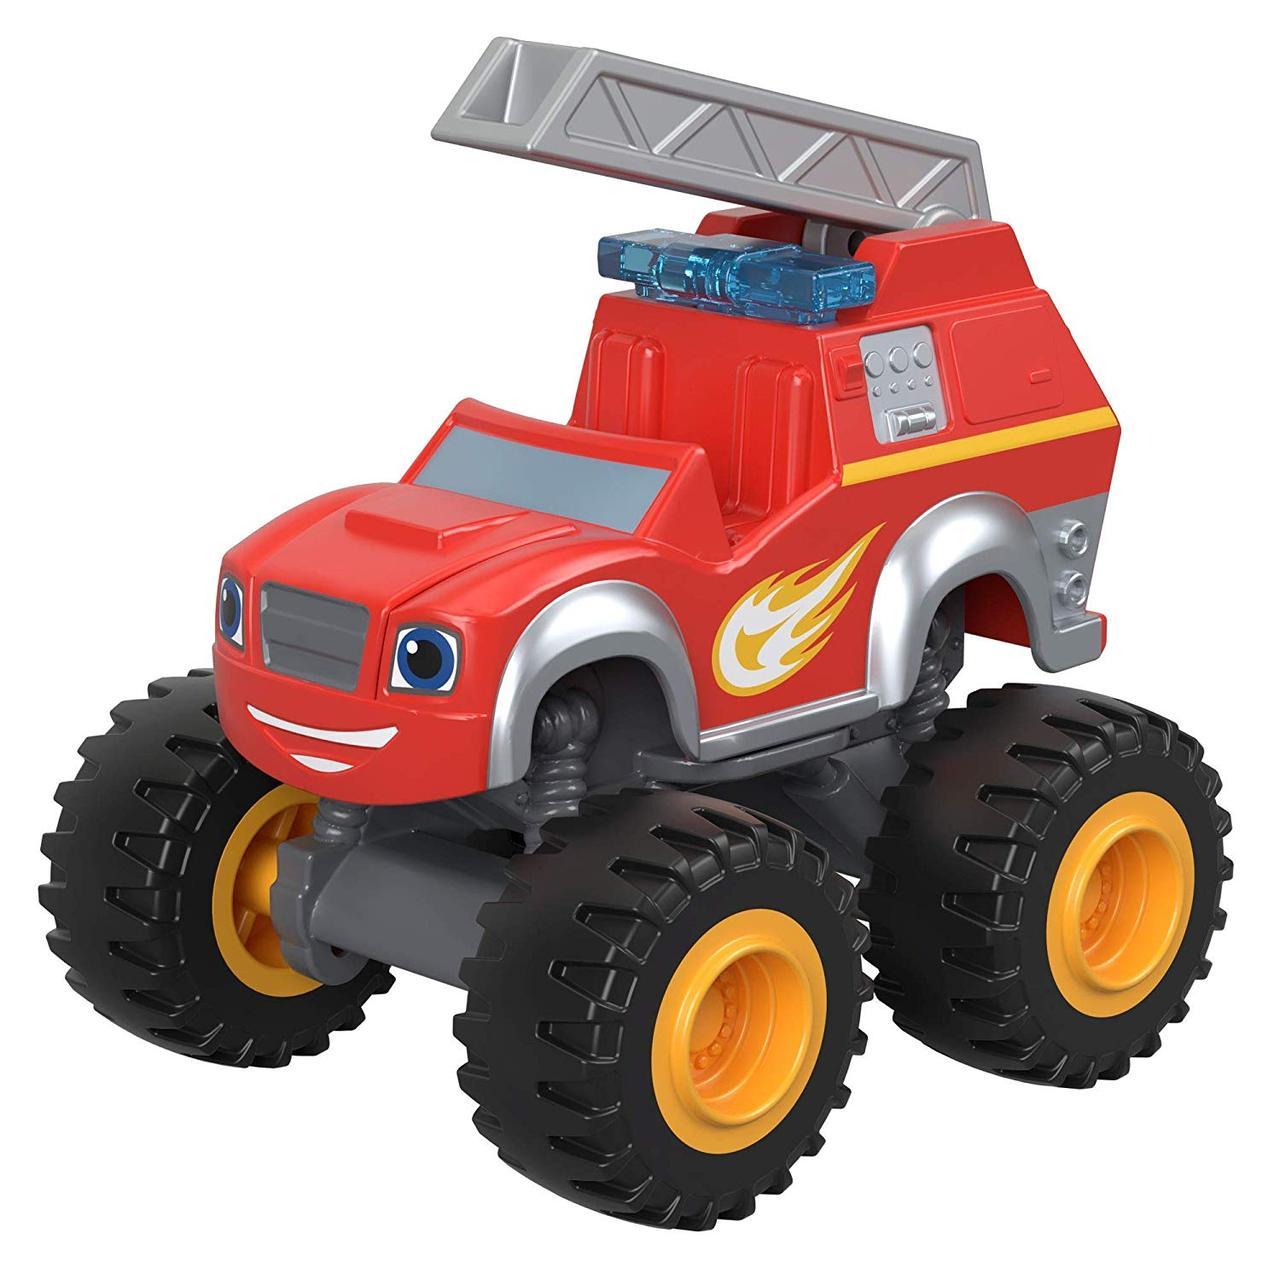 Fisher-Price Вспыш і диво-машинки Вспыш Пожежник Fire Rescue Blaze Monster Truck Diecast Vehilce